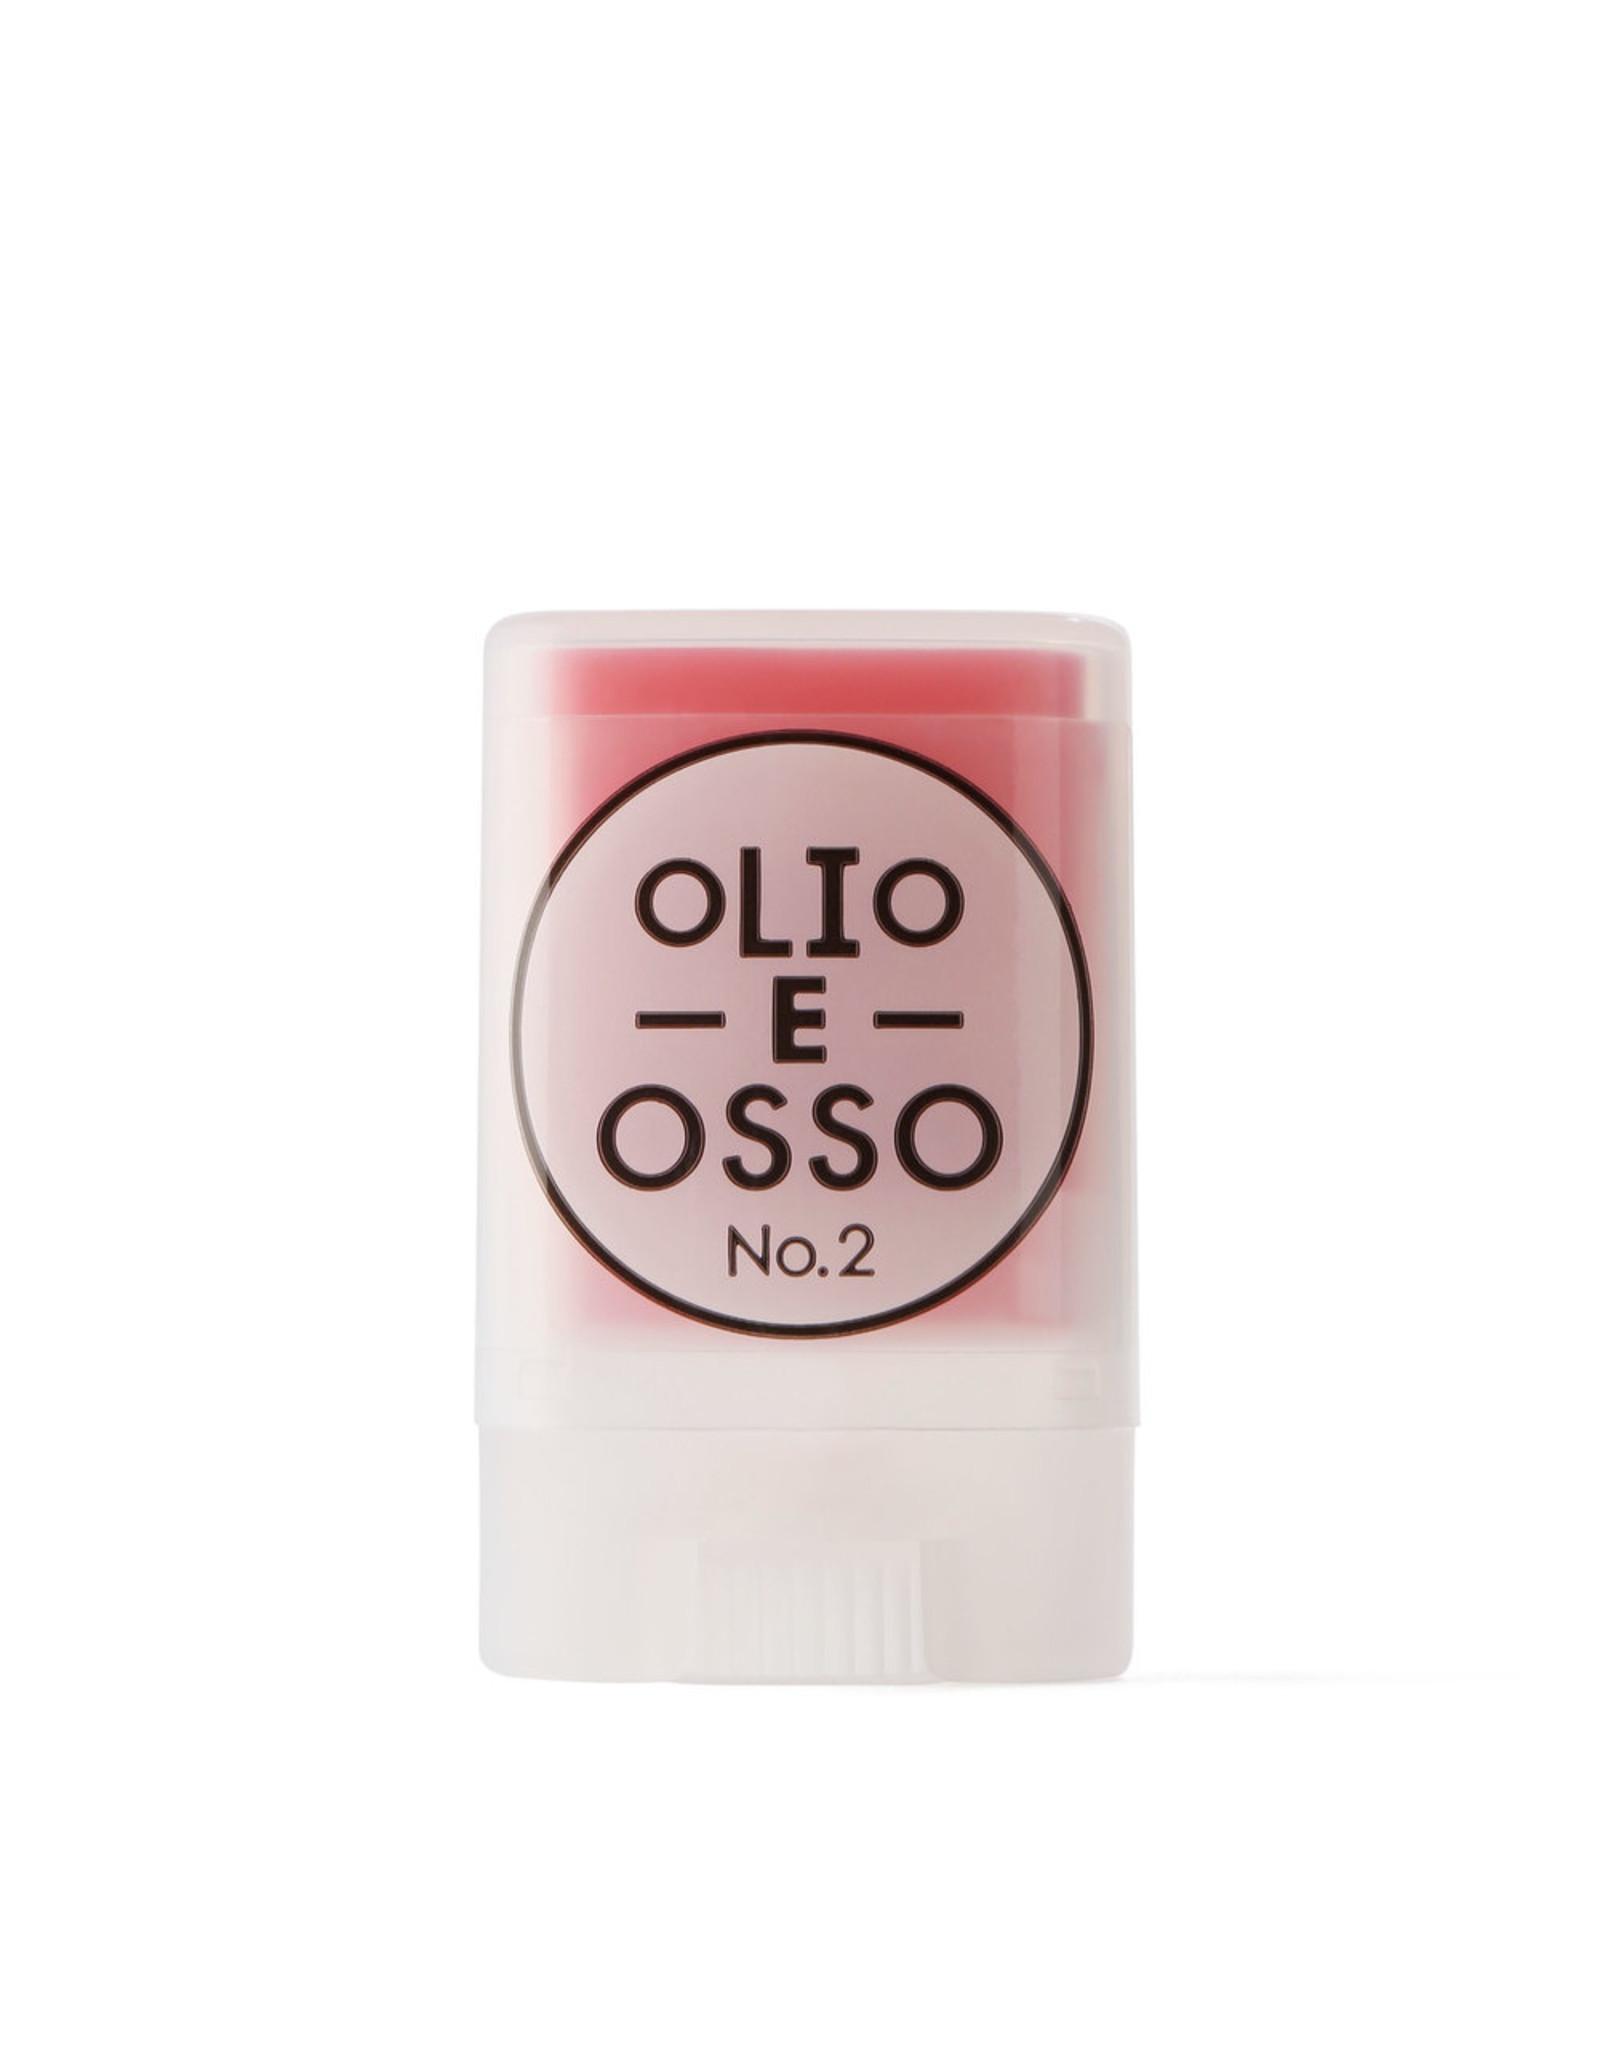 Olio E Osso No 2 - French Melon Balm